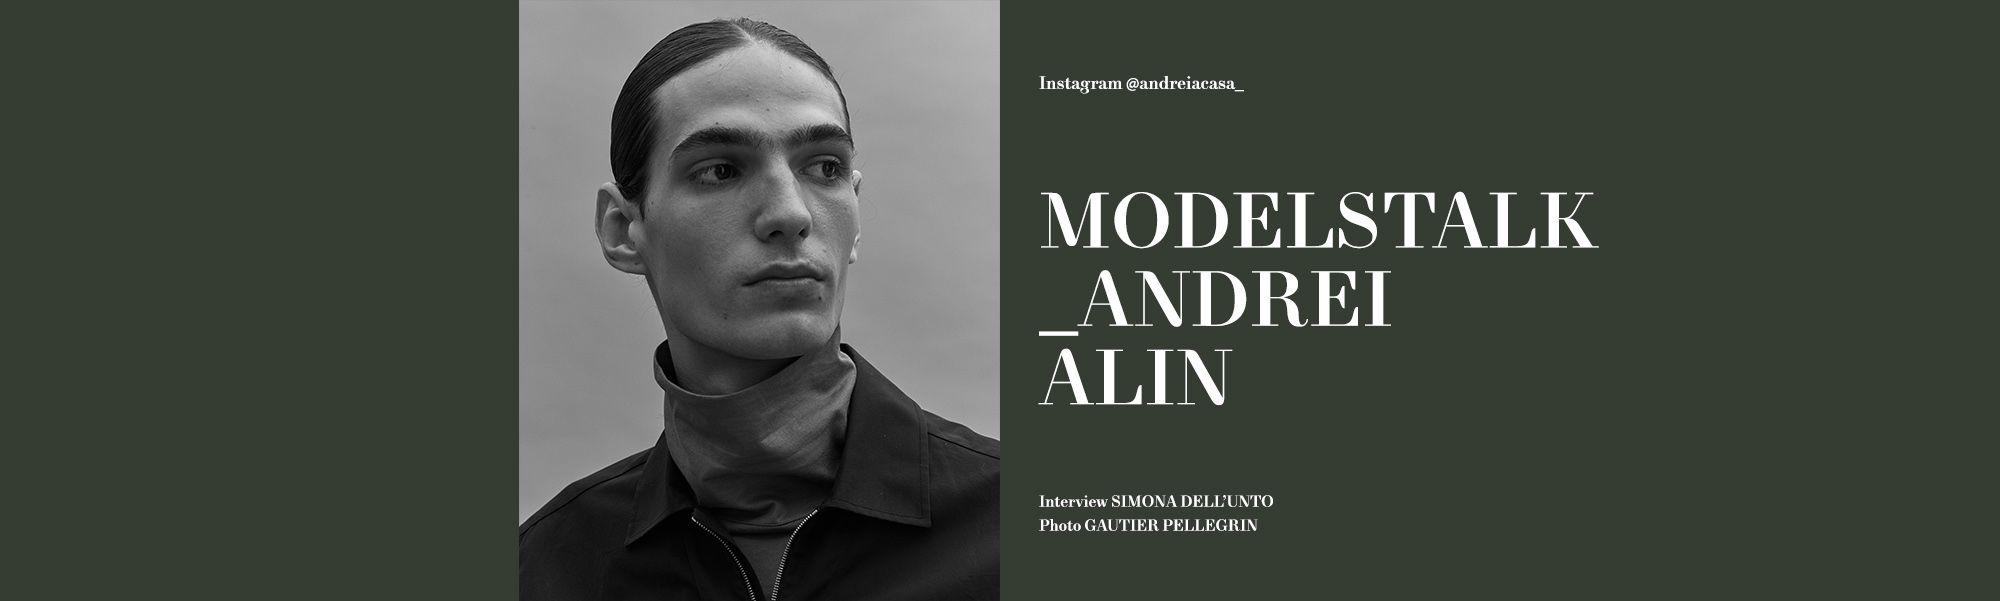 andrei-alin-thegreatestmagazine-banner